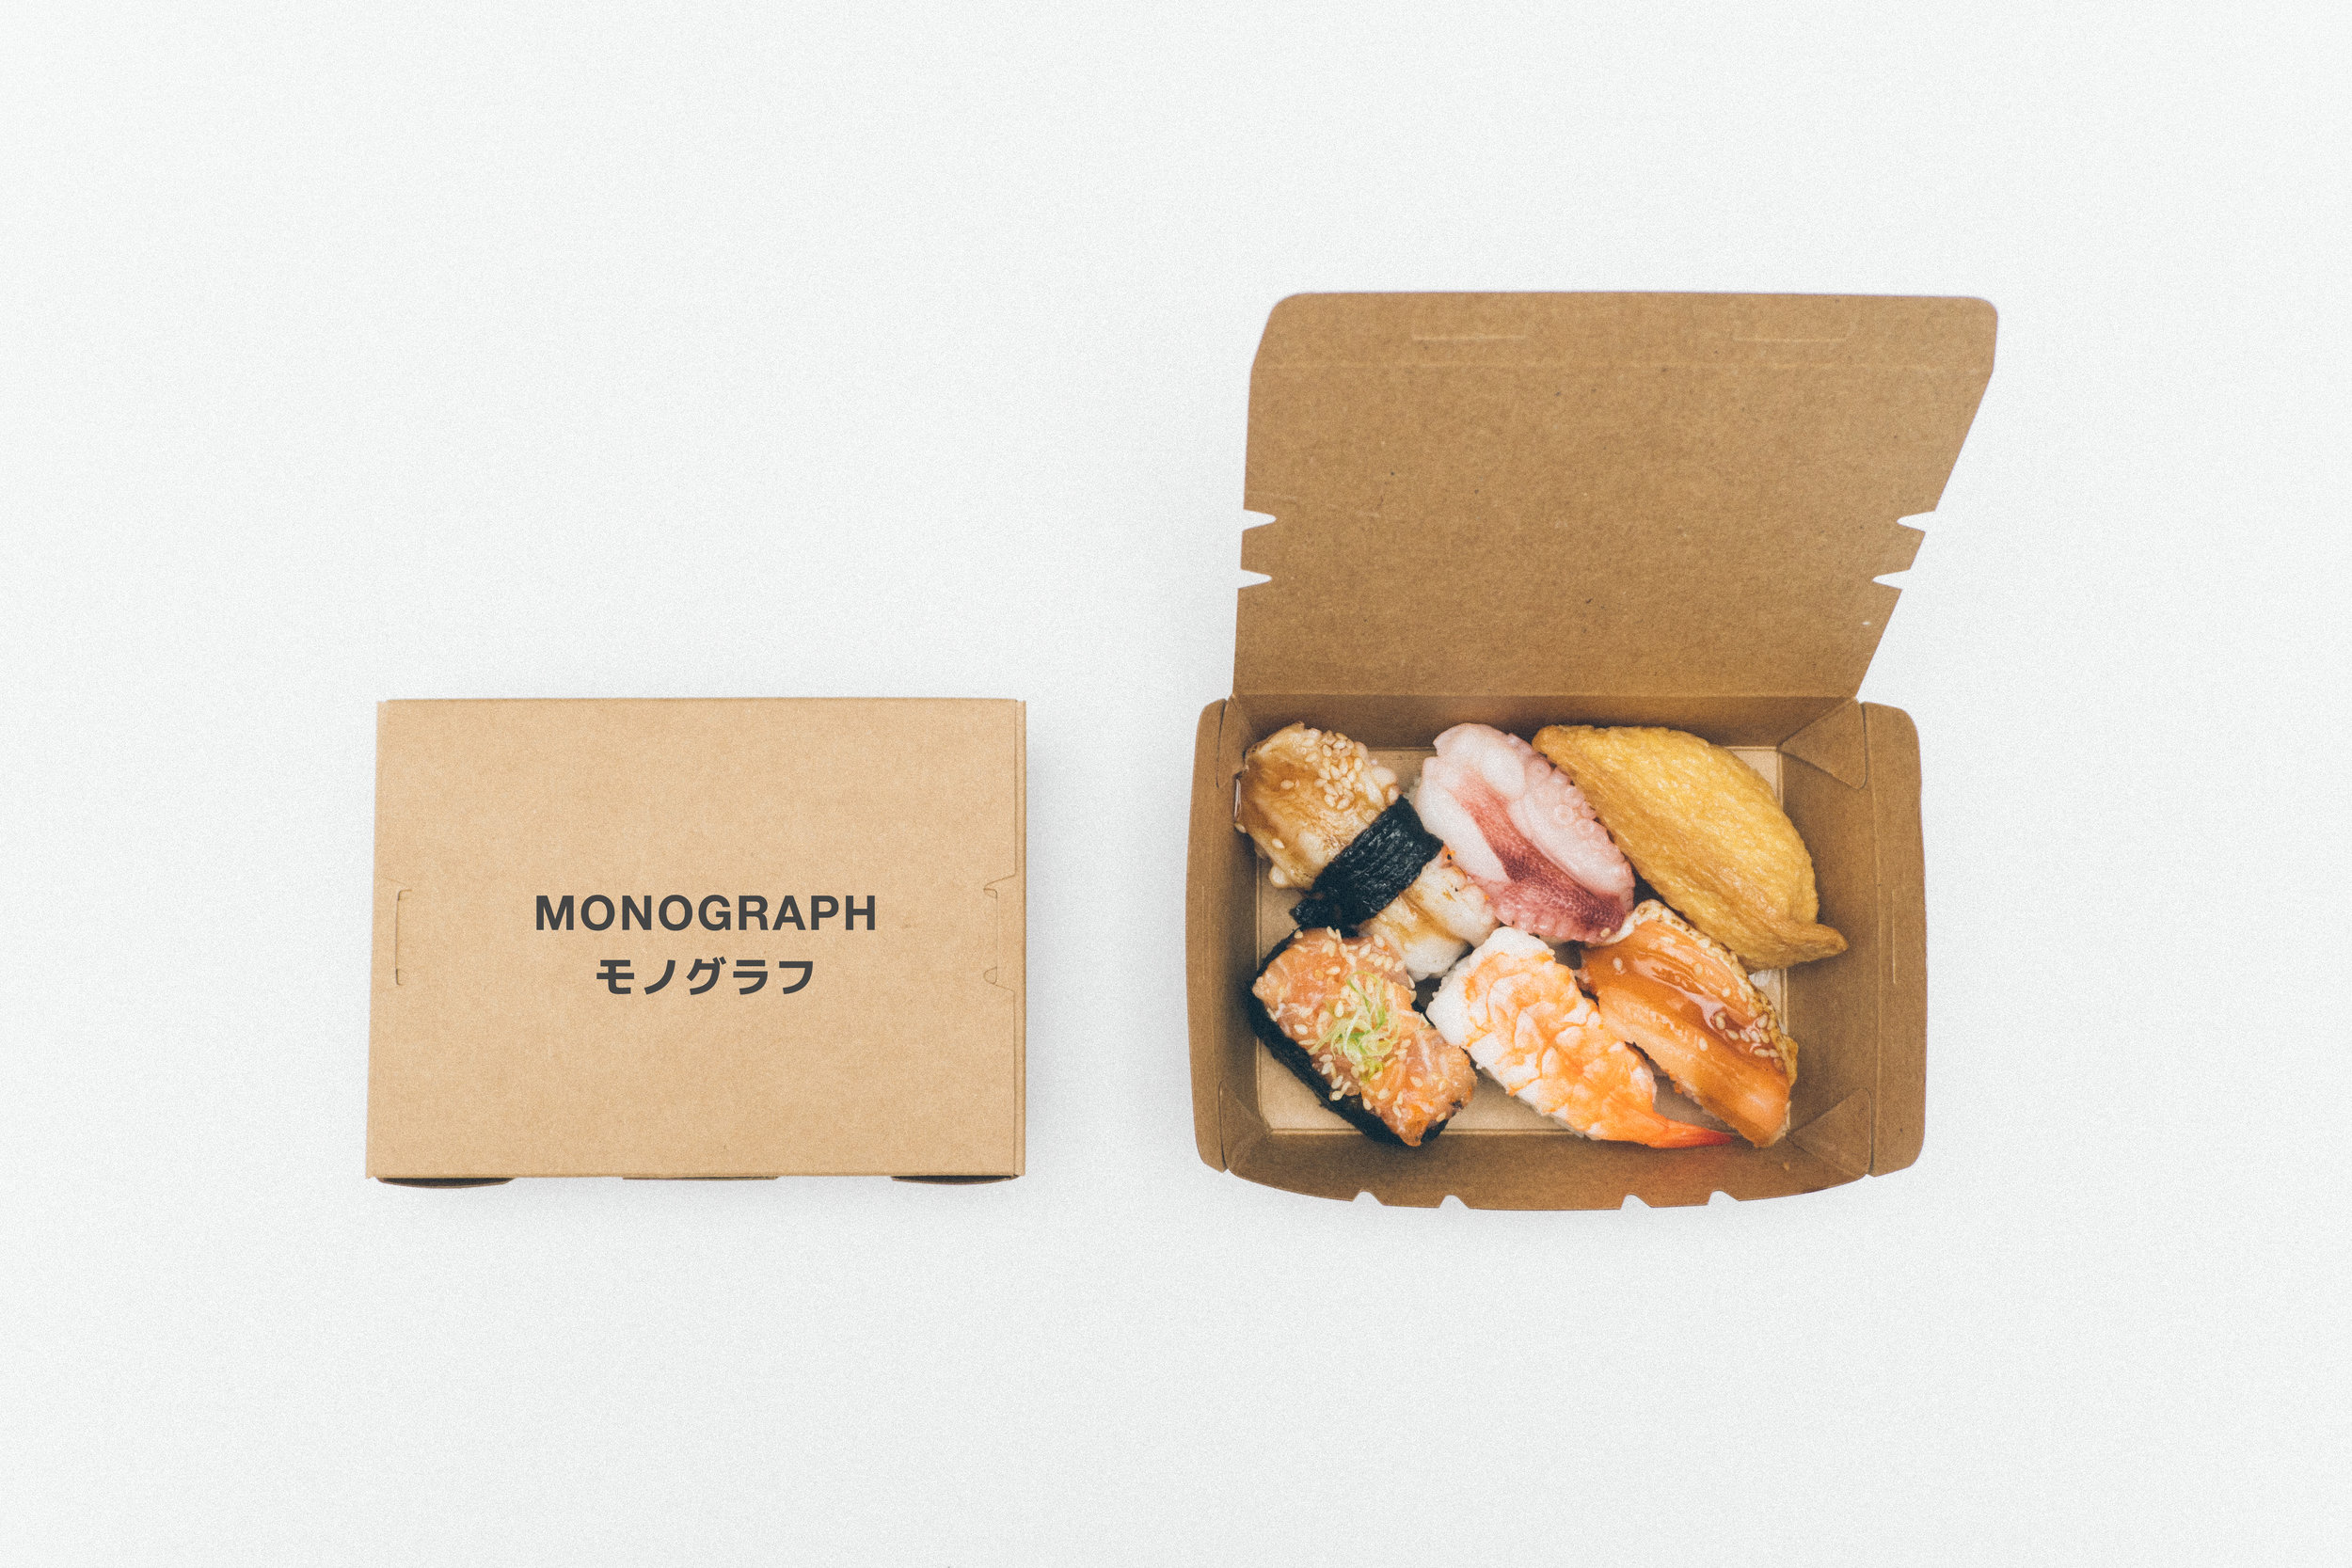 Monograph-sushi-3-white.jpg